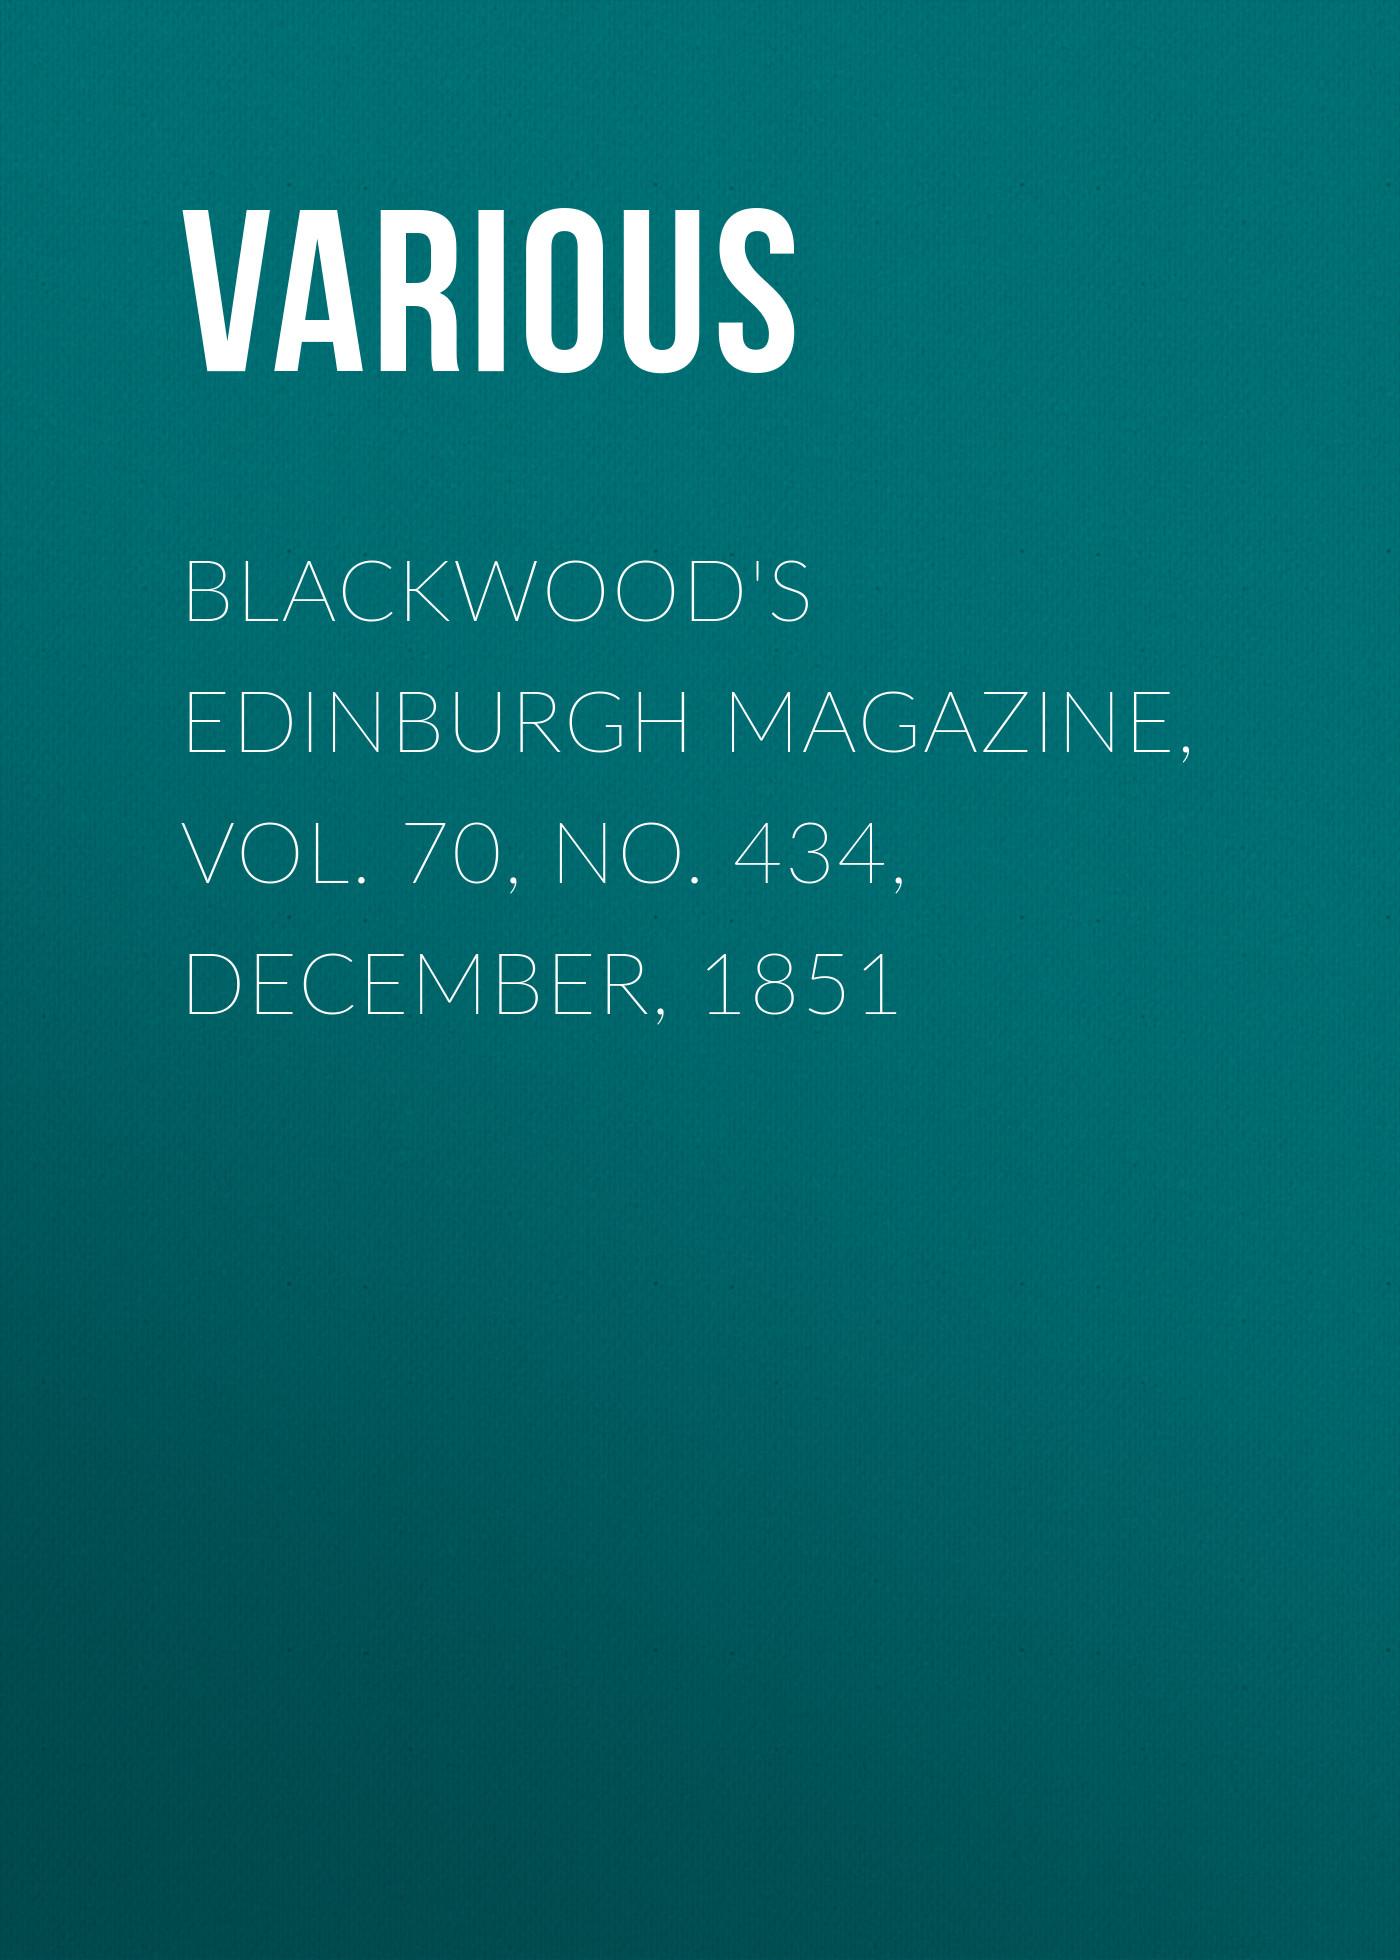 лучшая цена Various Blackwood's Edinburgh Magazine, Vol. 70, No. 434, December, 1851